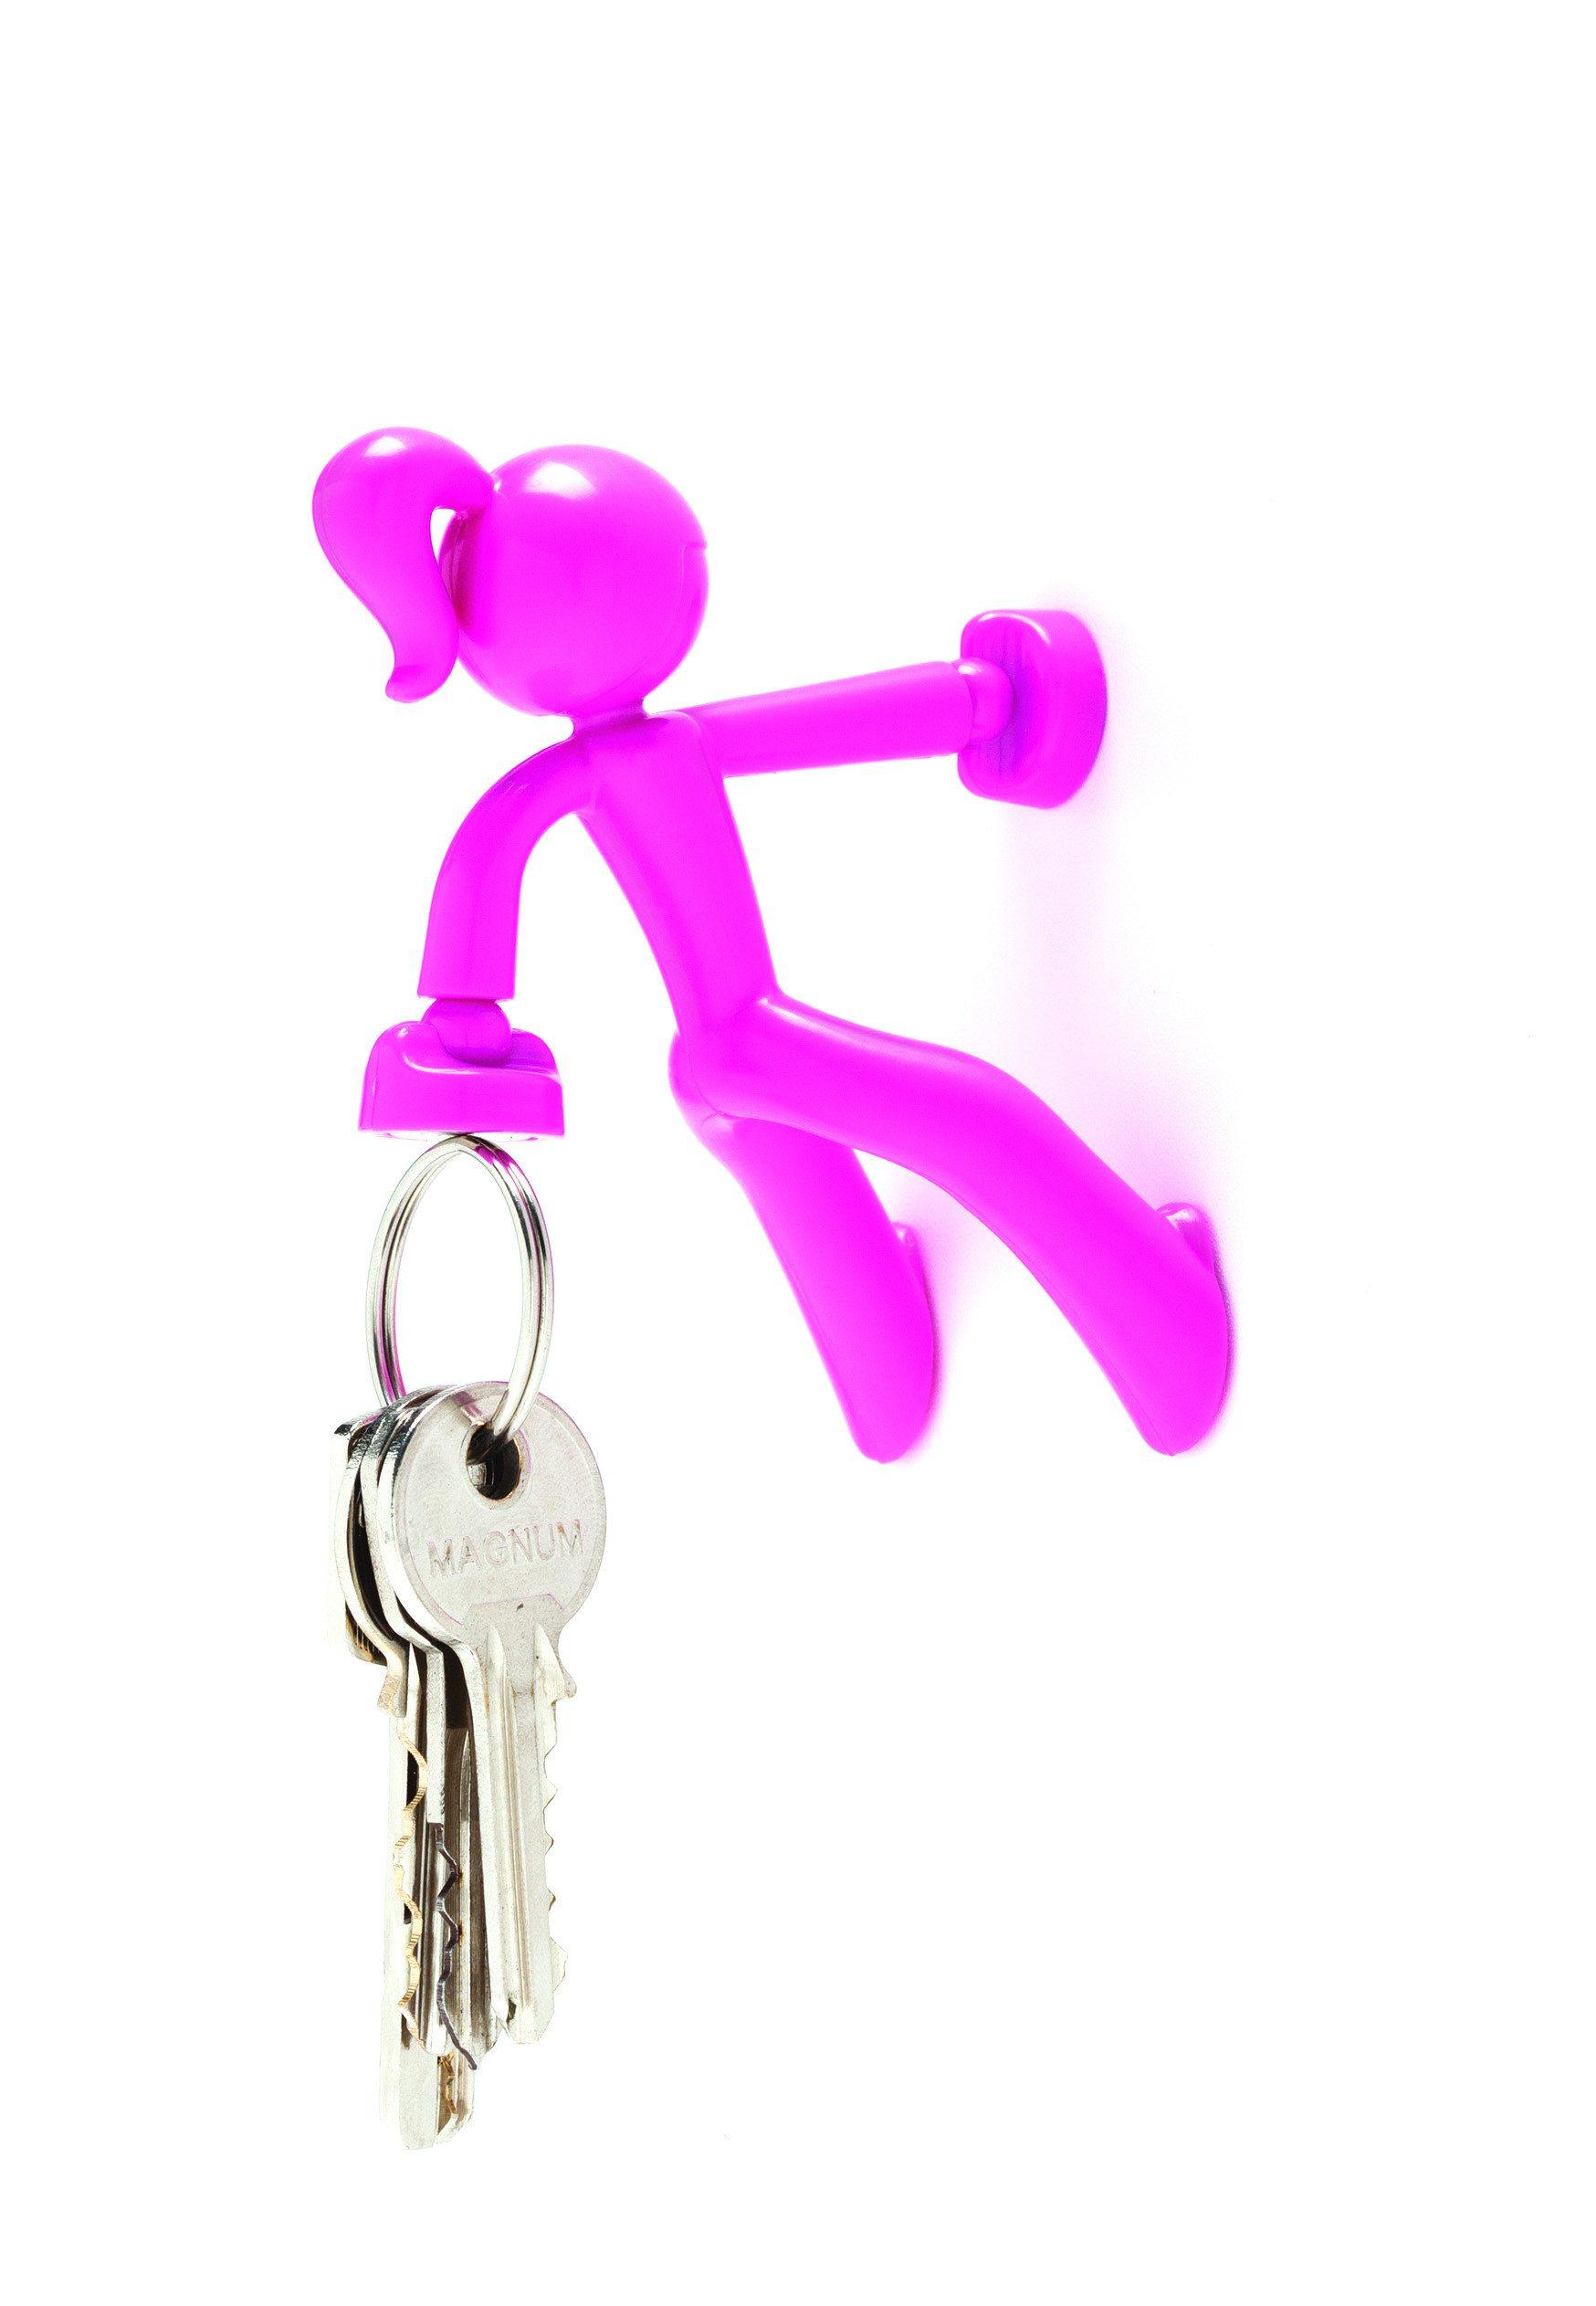 Magnetische sleutelhouder Petite